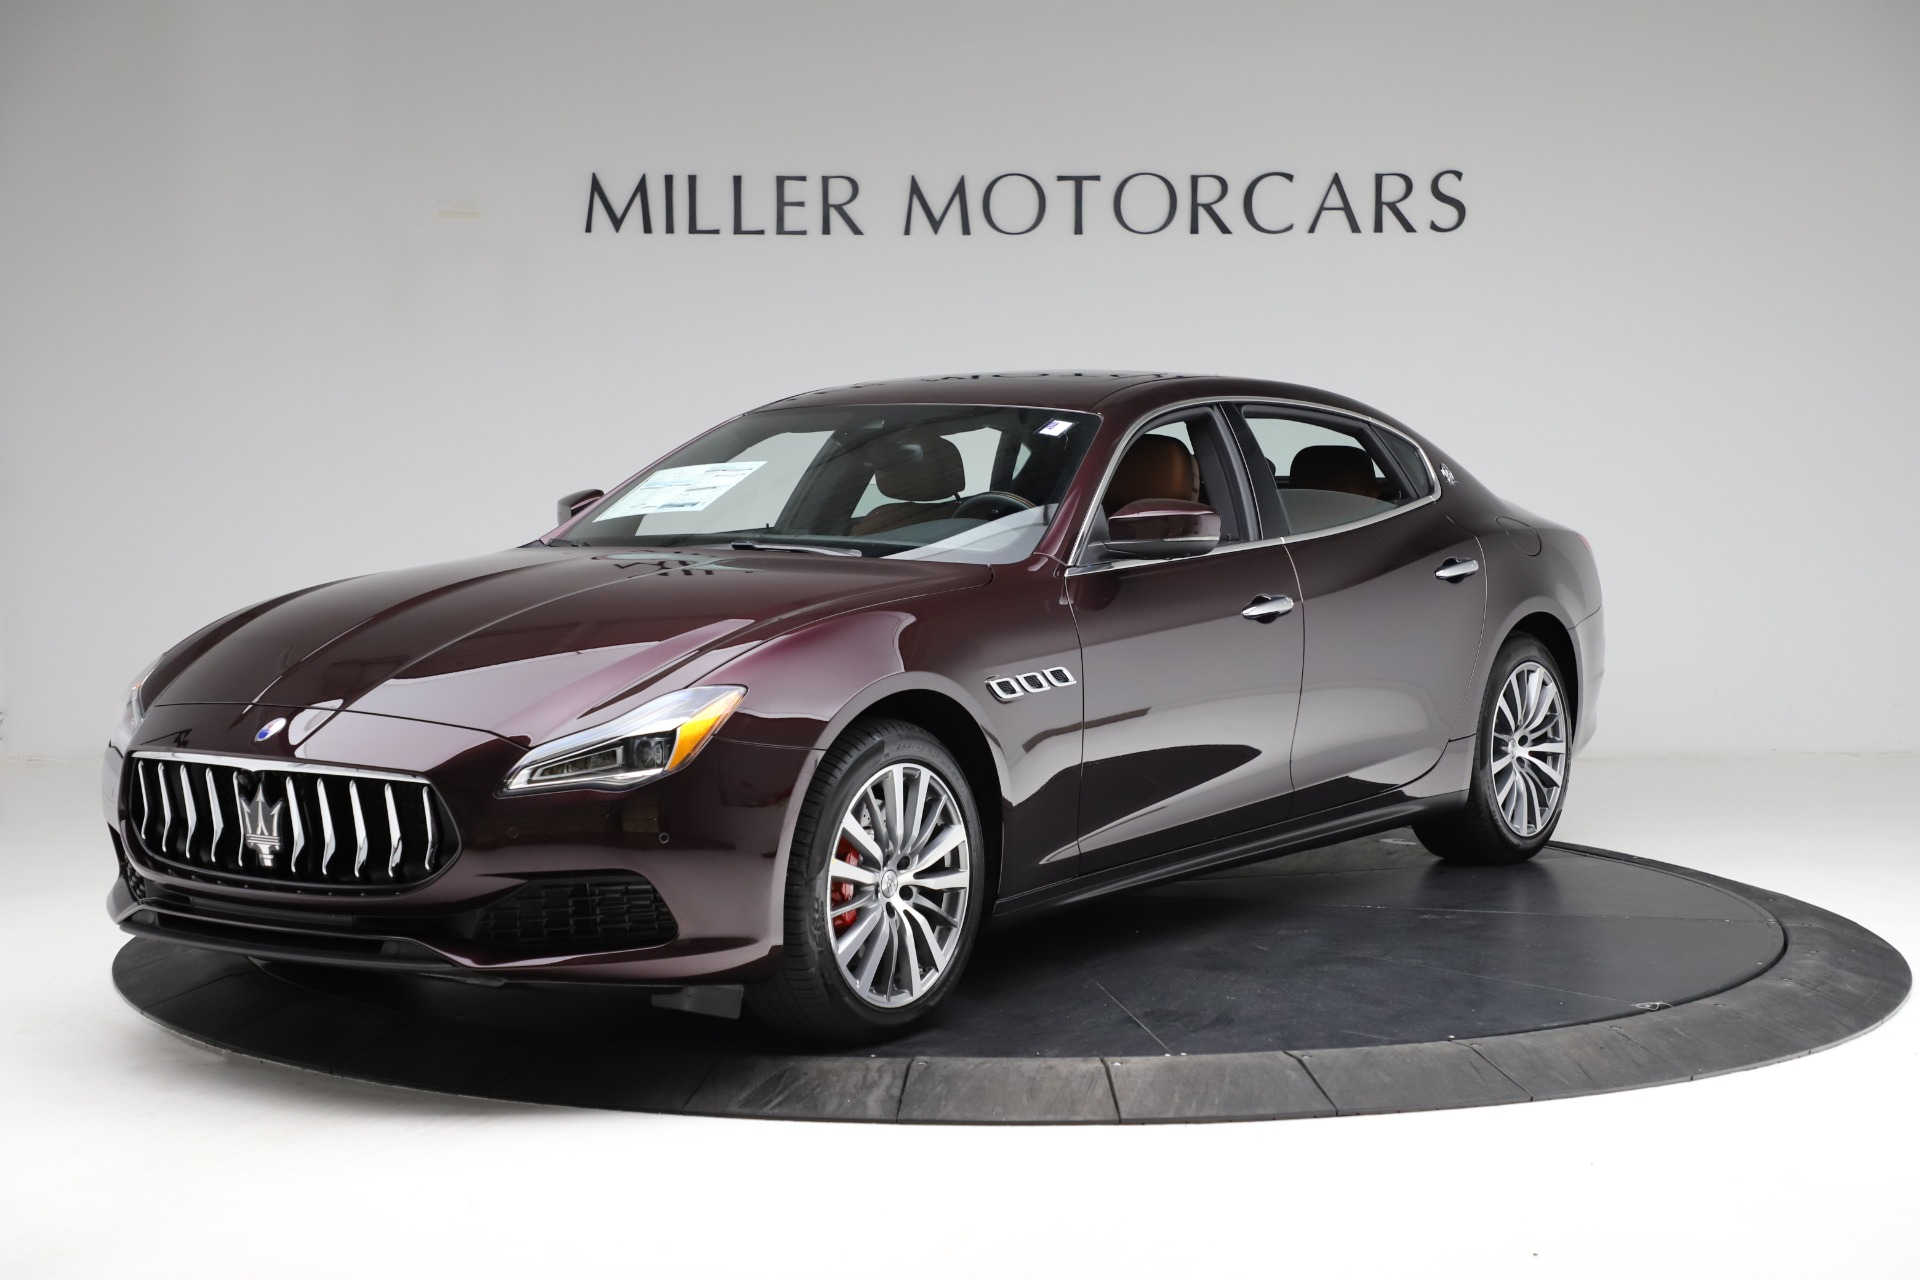 New 2021 Maserati Quattroporte S Q4 for sale $114,149 at Rolls-Royce Motor Cars Greenwich in Greenwich CT 06830 1